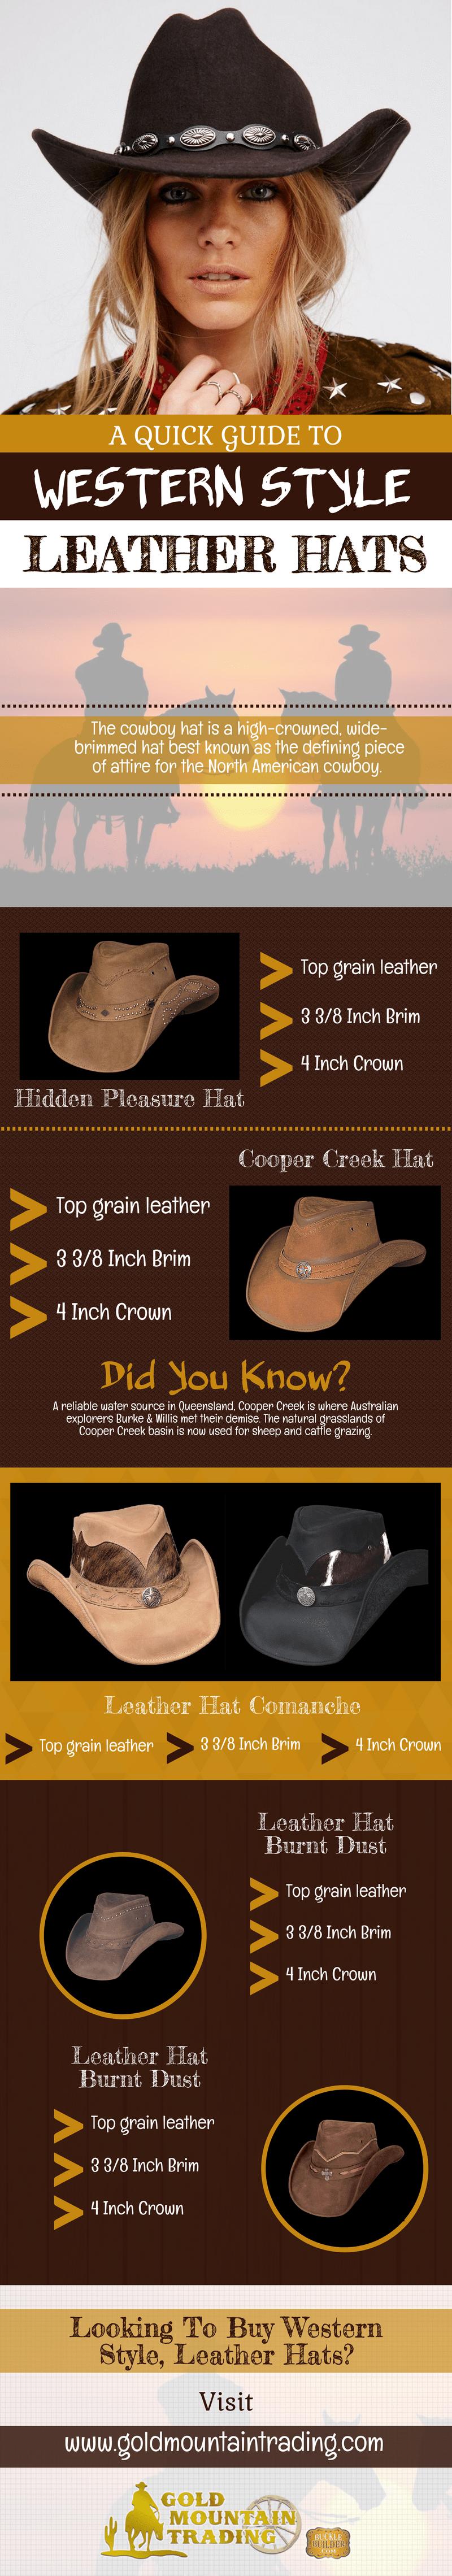 Cowboy hat style